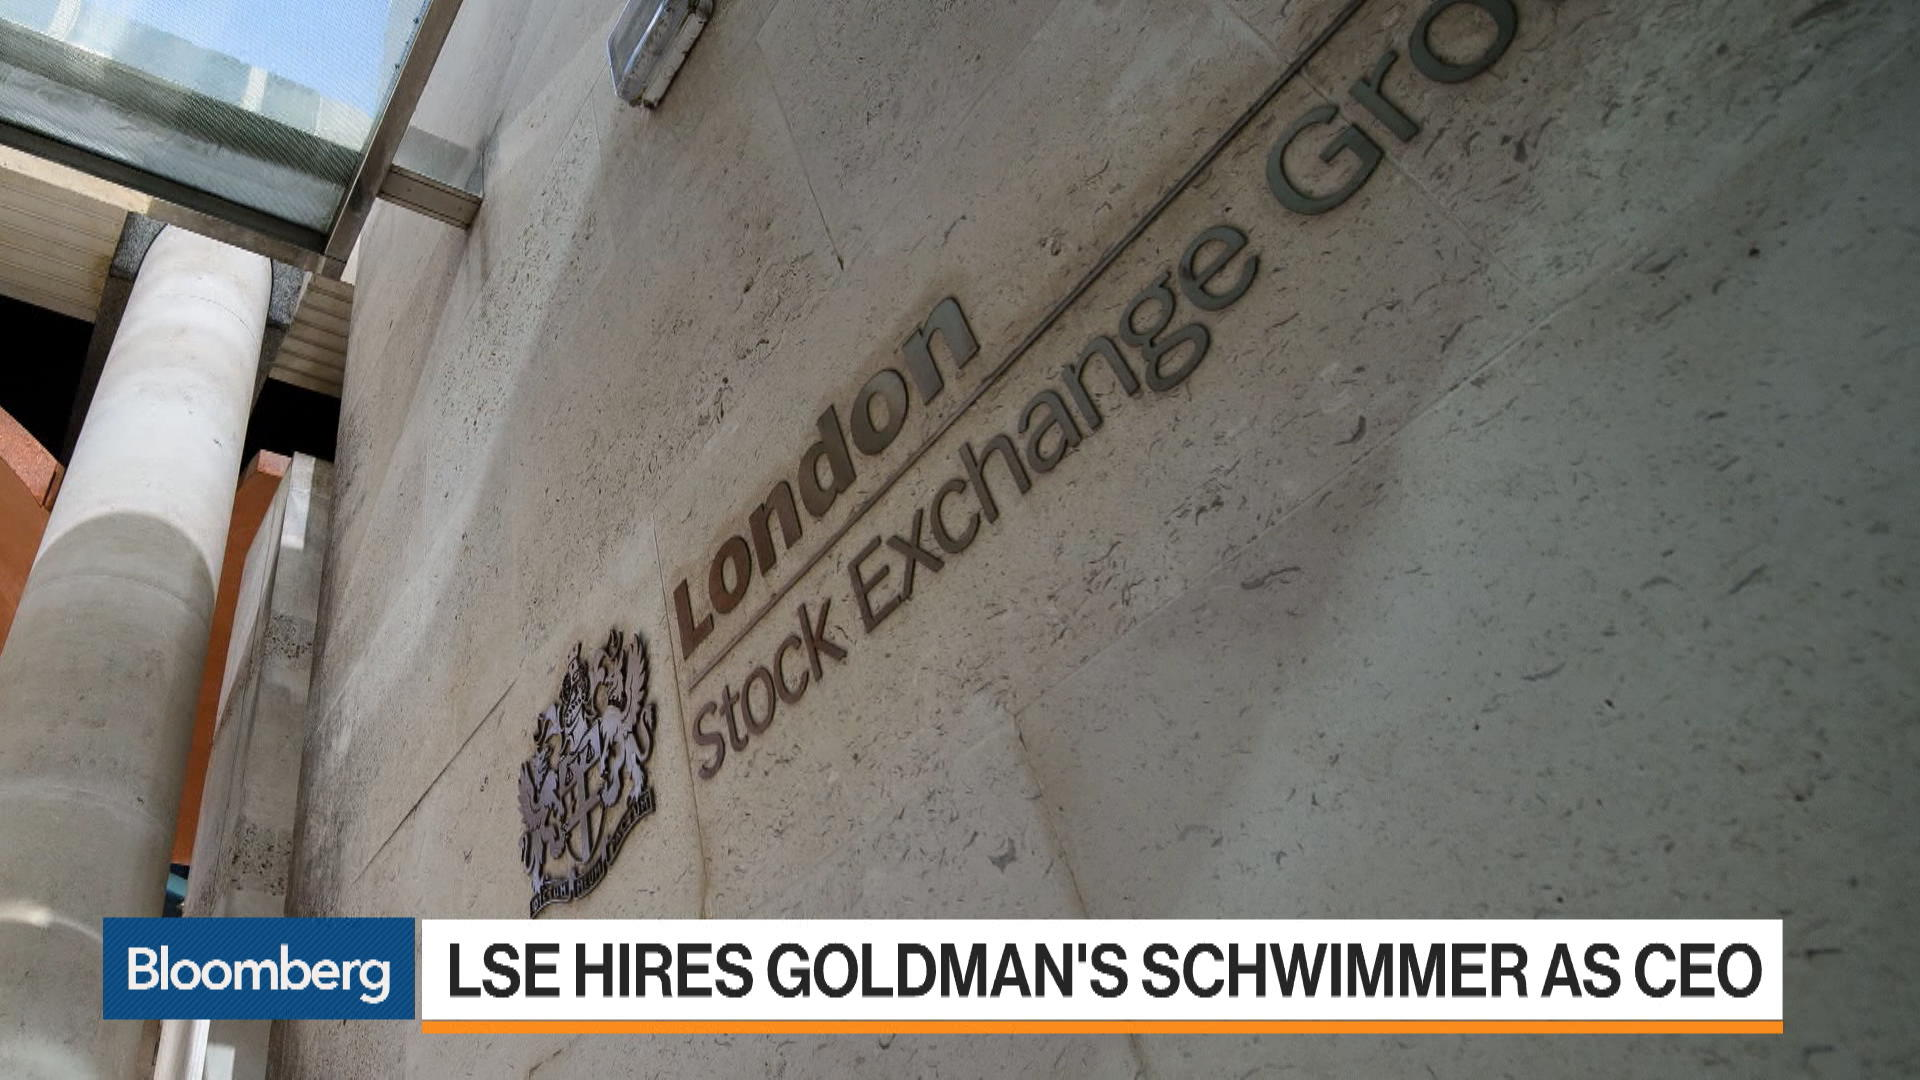 LSE:London Stock Quote - London Stock Exchange Group PLC